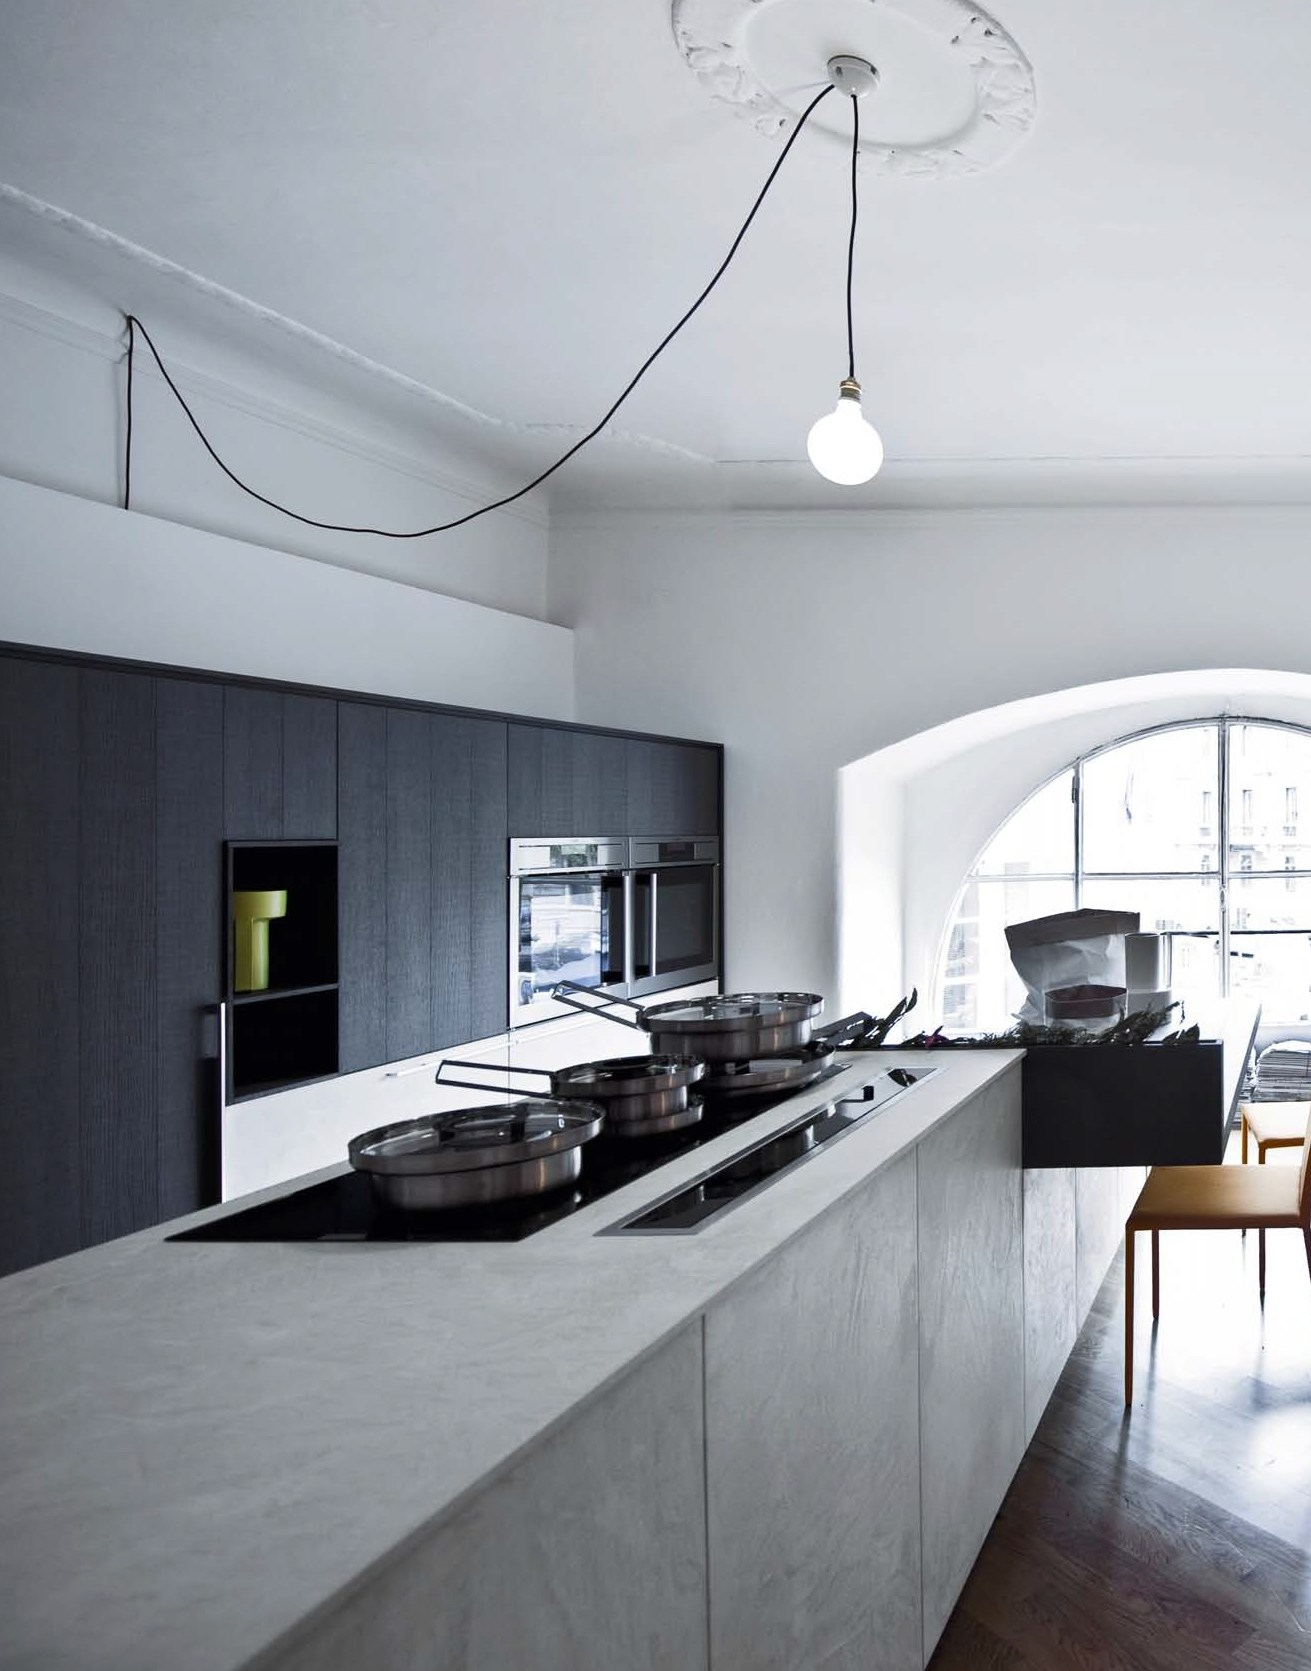 Cucina con isola senza maniglie kalea composizione 9 by - Cucina senza maniglie ...